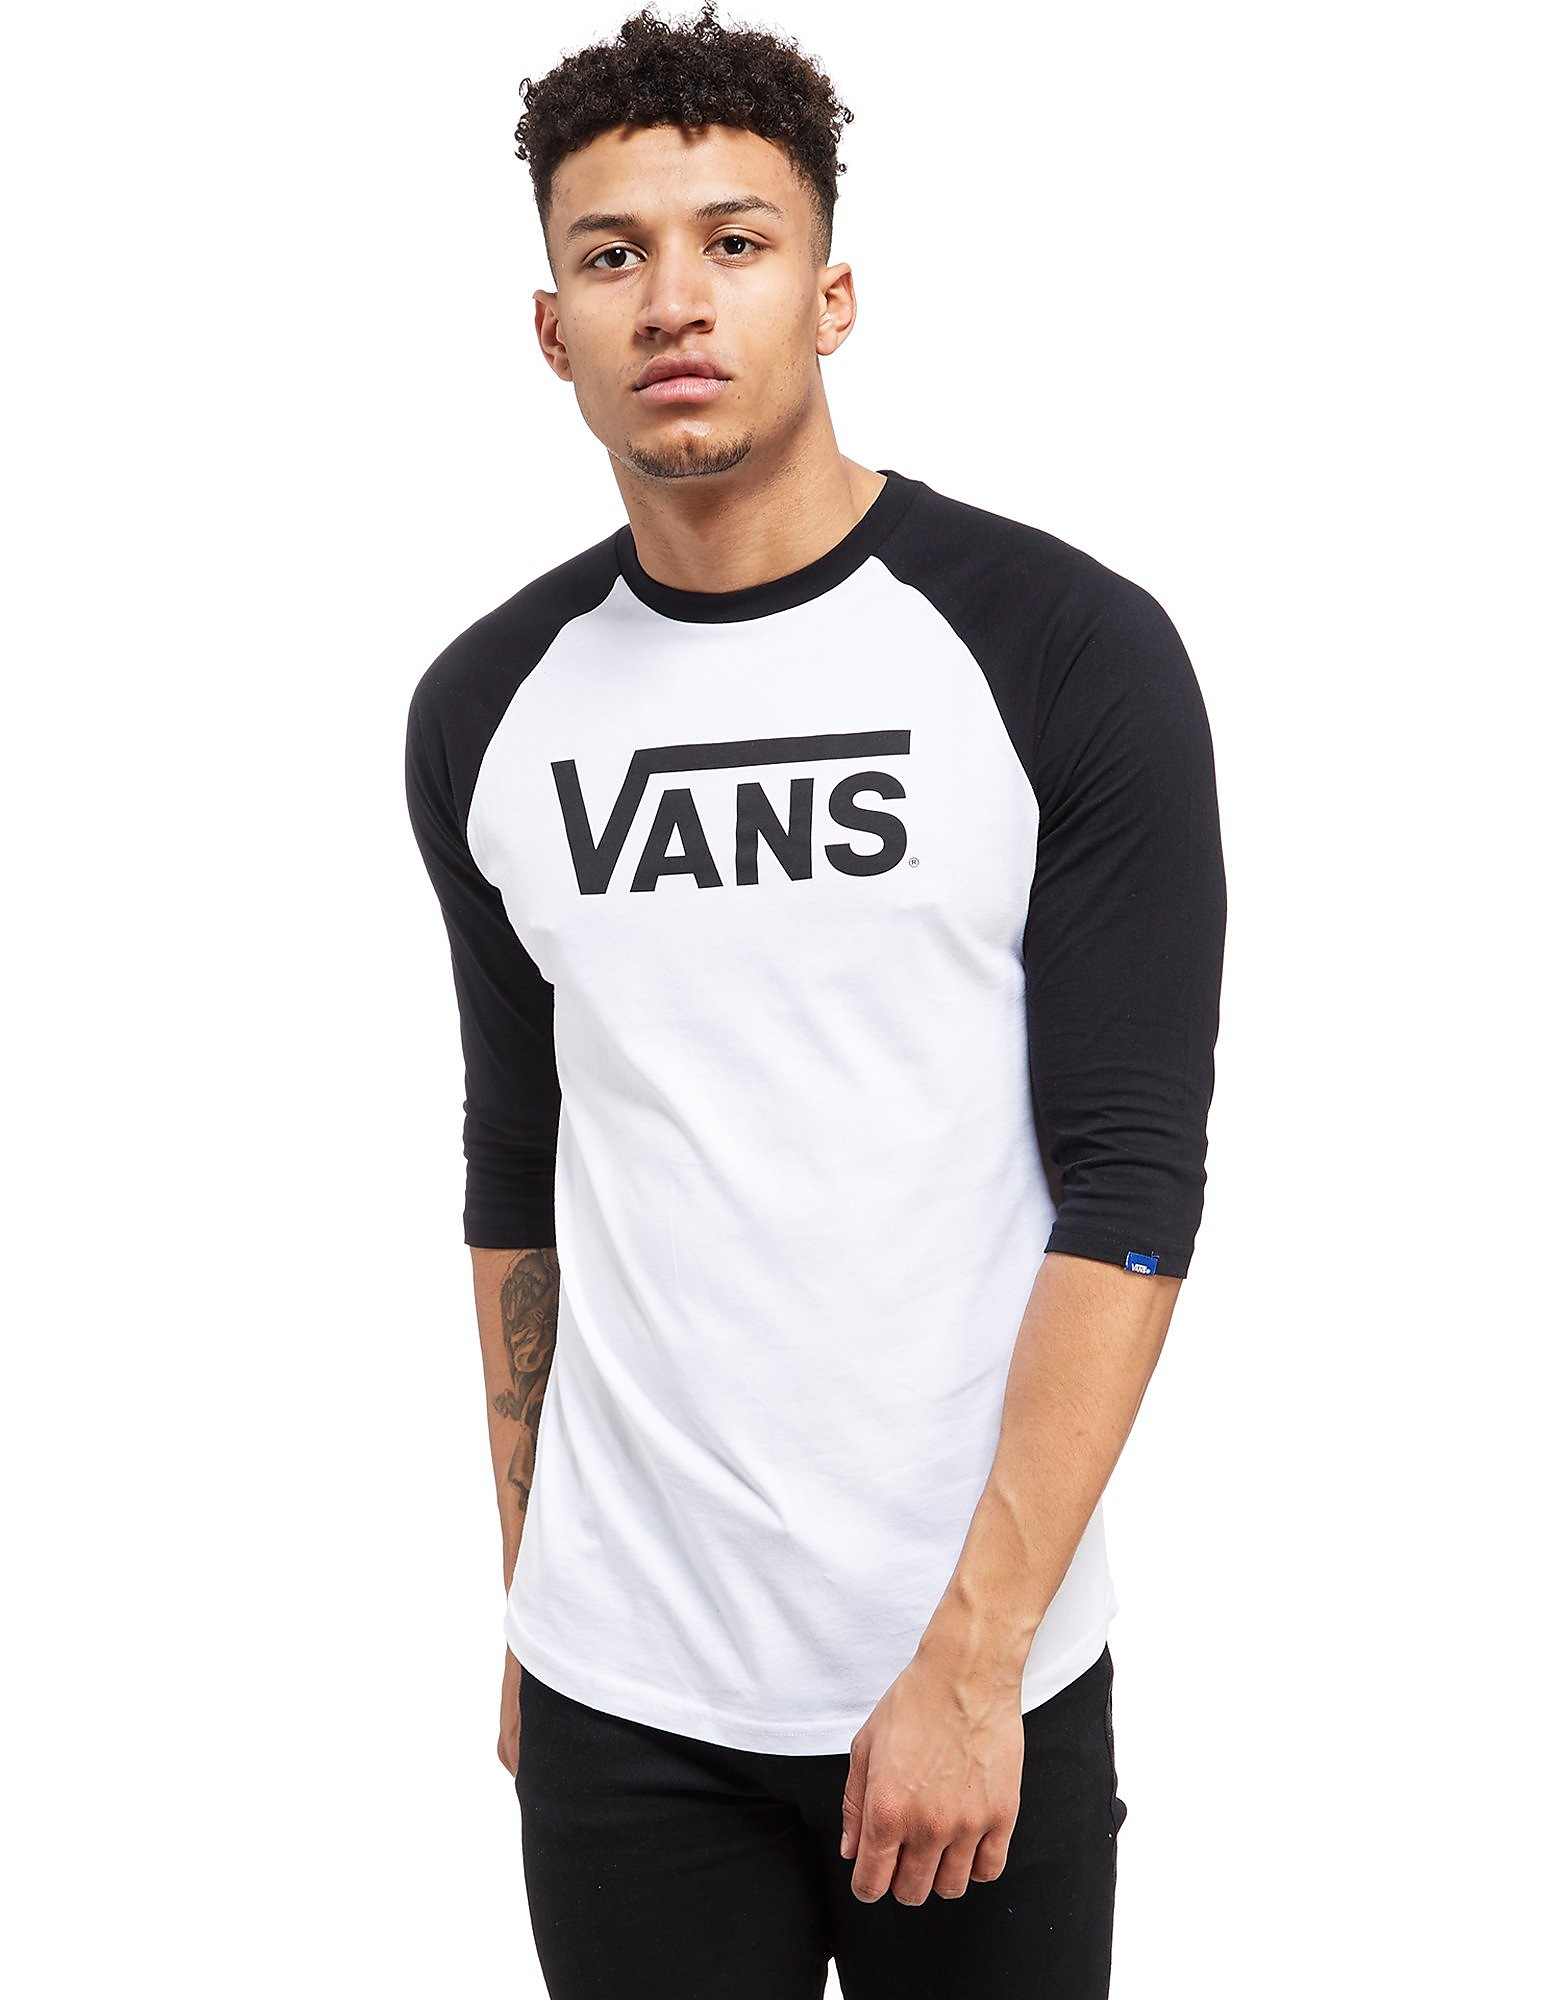 Vans Classic 3/4 Raglan T-Shirt